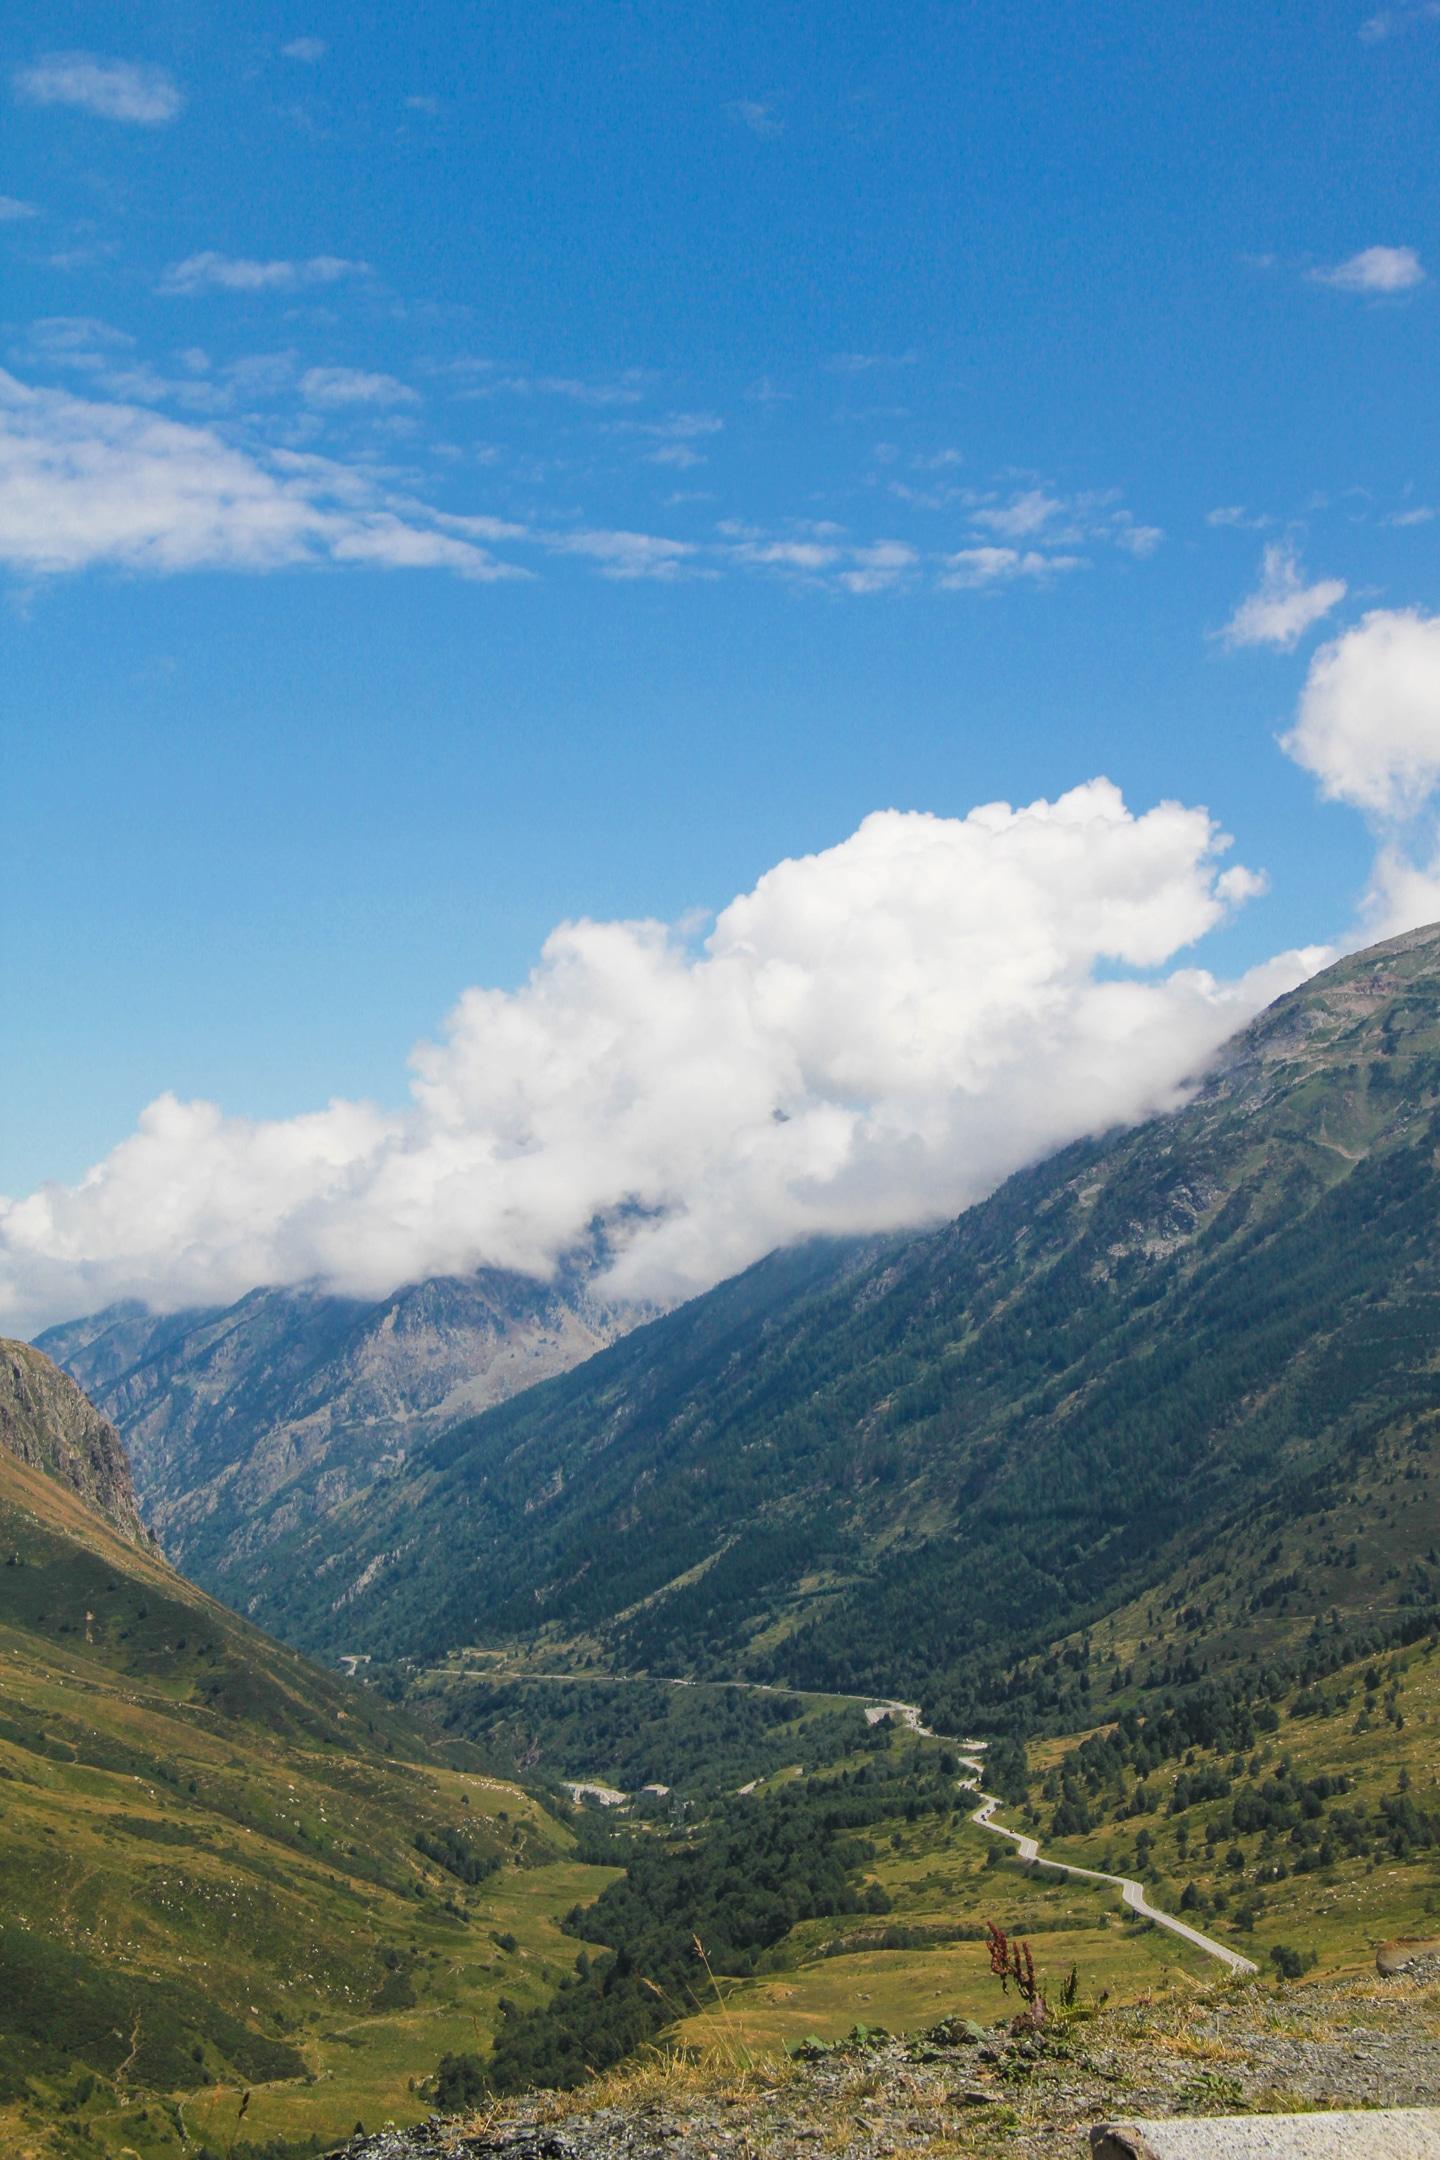 20150922_Roadtrip_to_Andorra_07.jpg